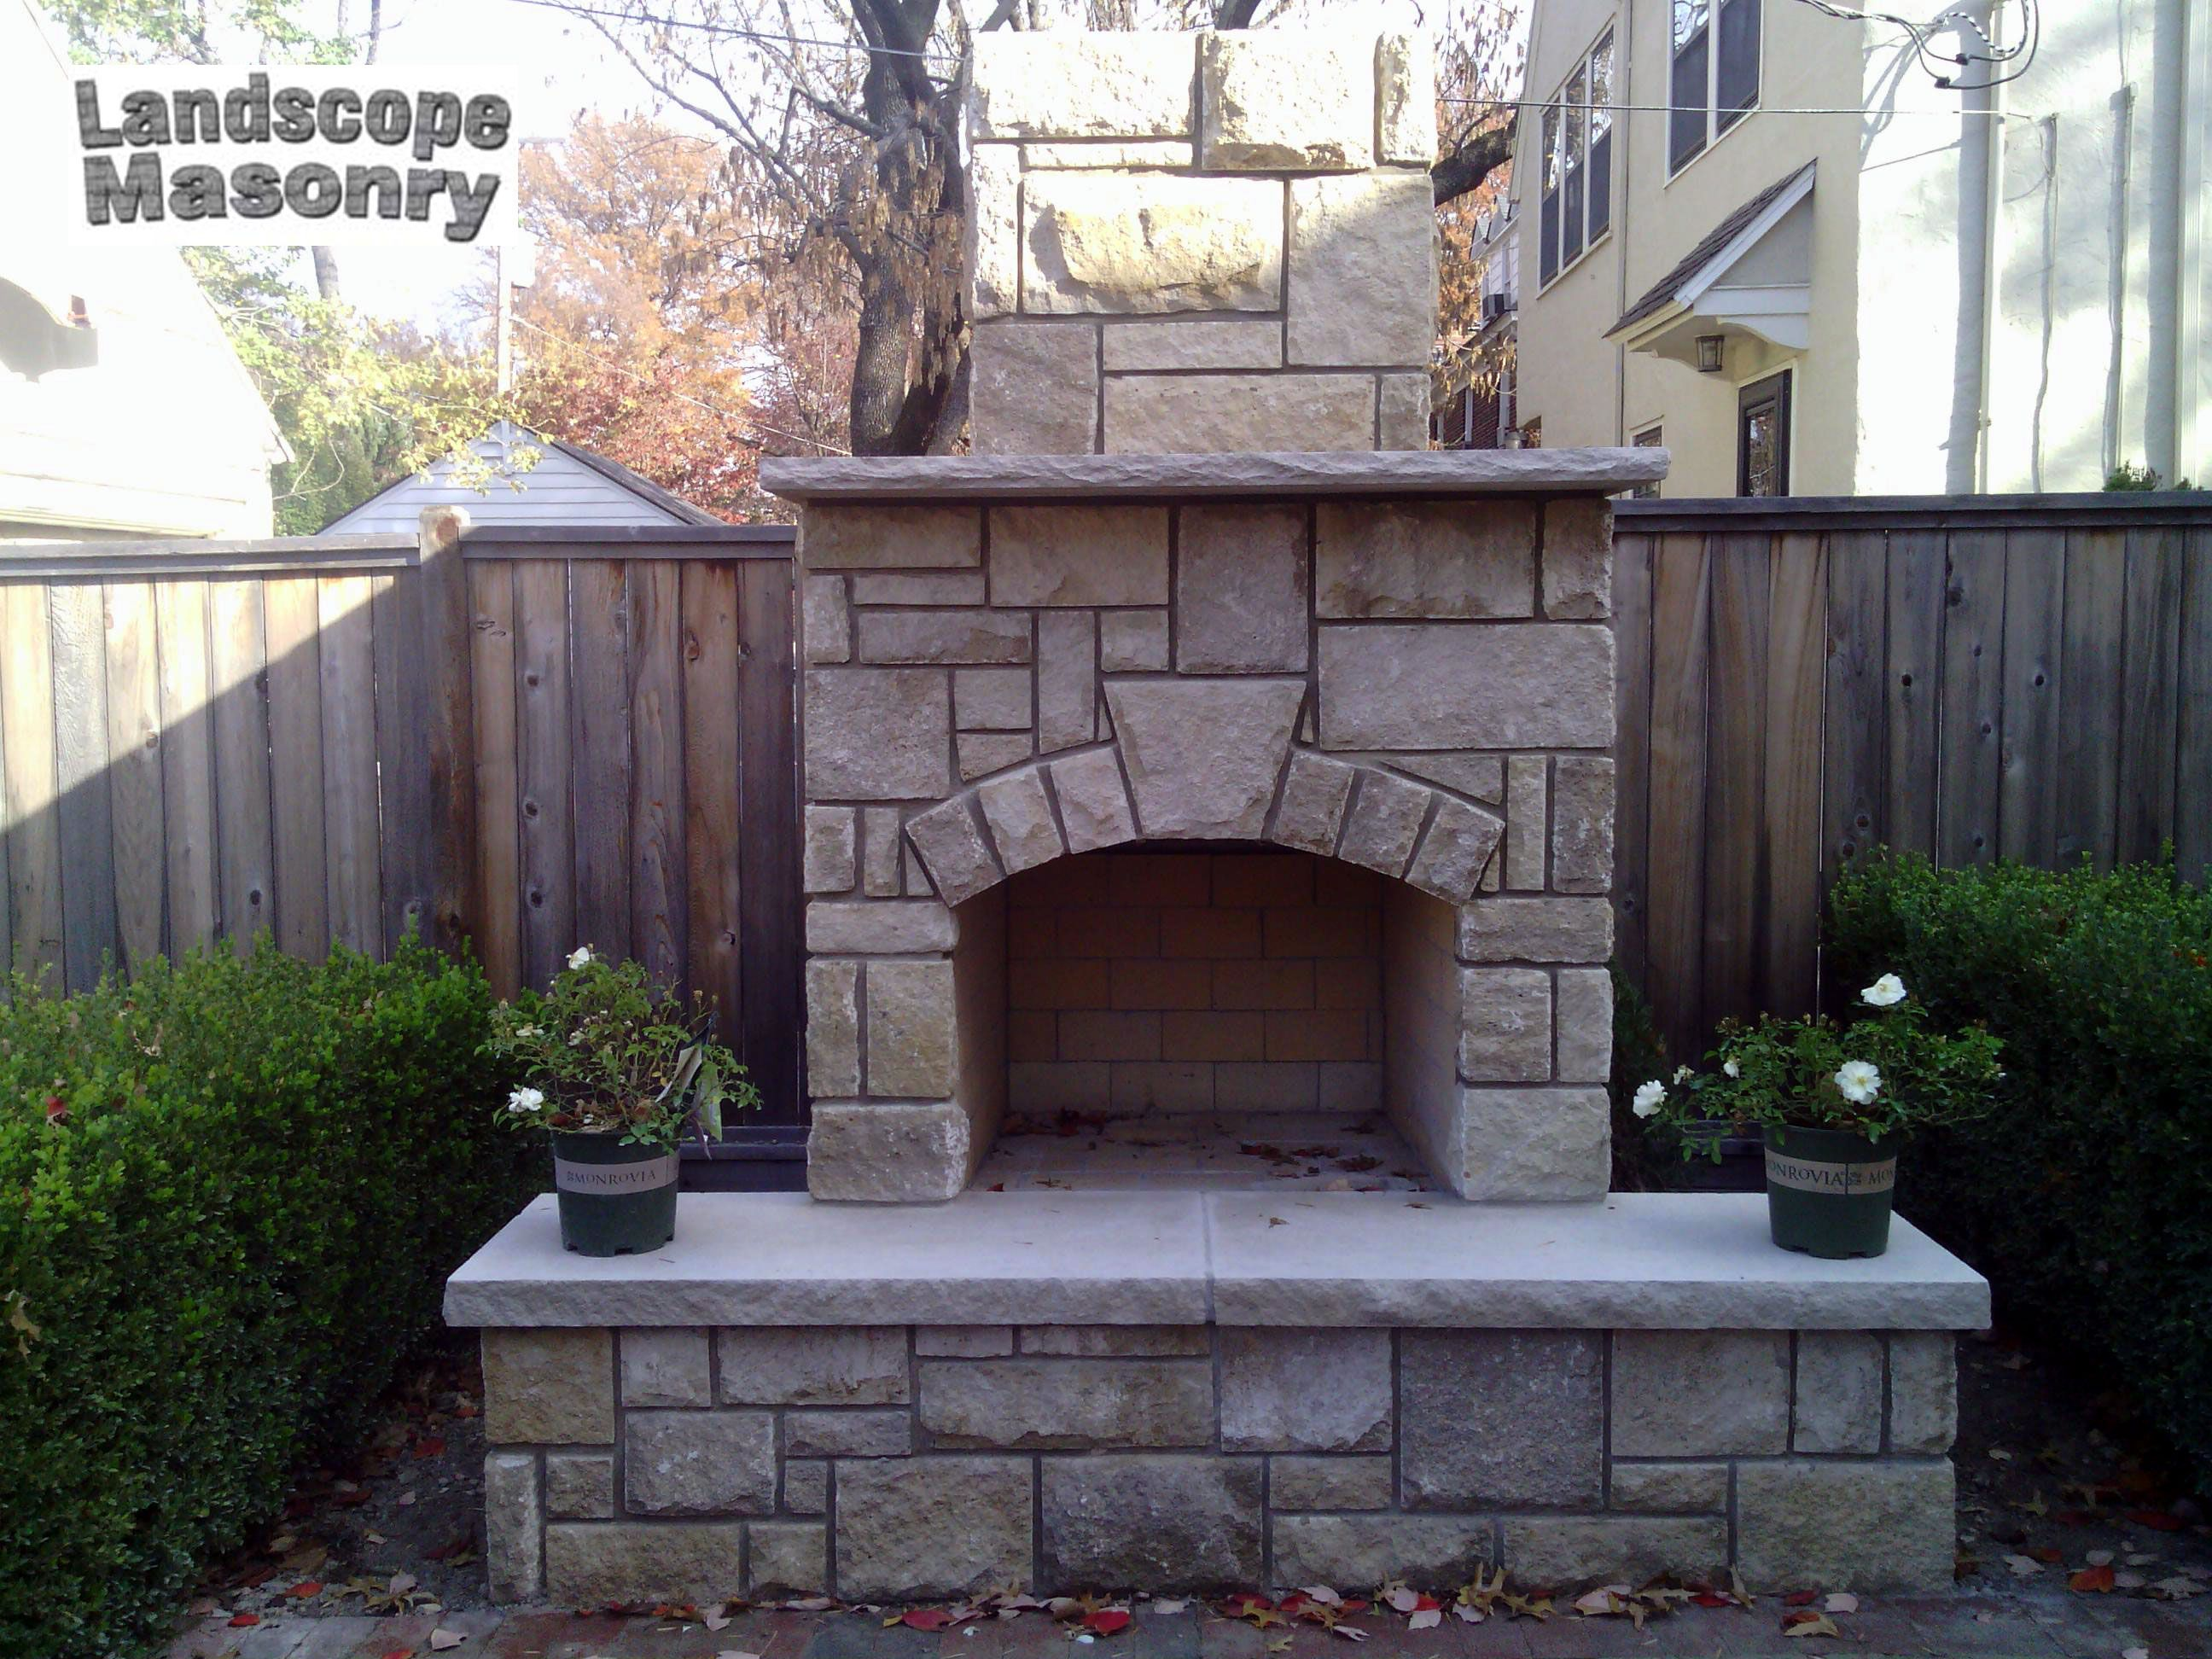 Outdoor Fireplaces Diy Outdoor Fireplace Outdoor Fireplace Plans Outdoor Fireplace Kits